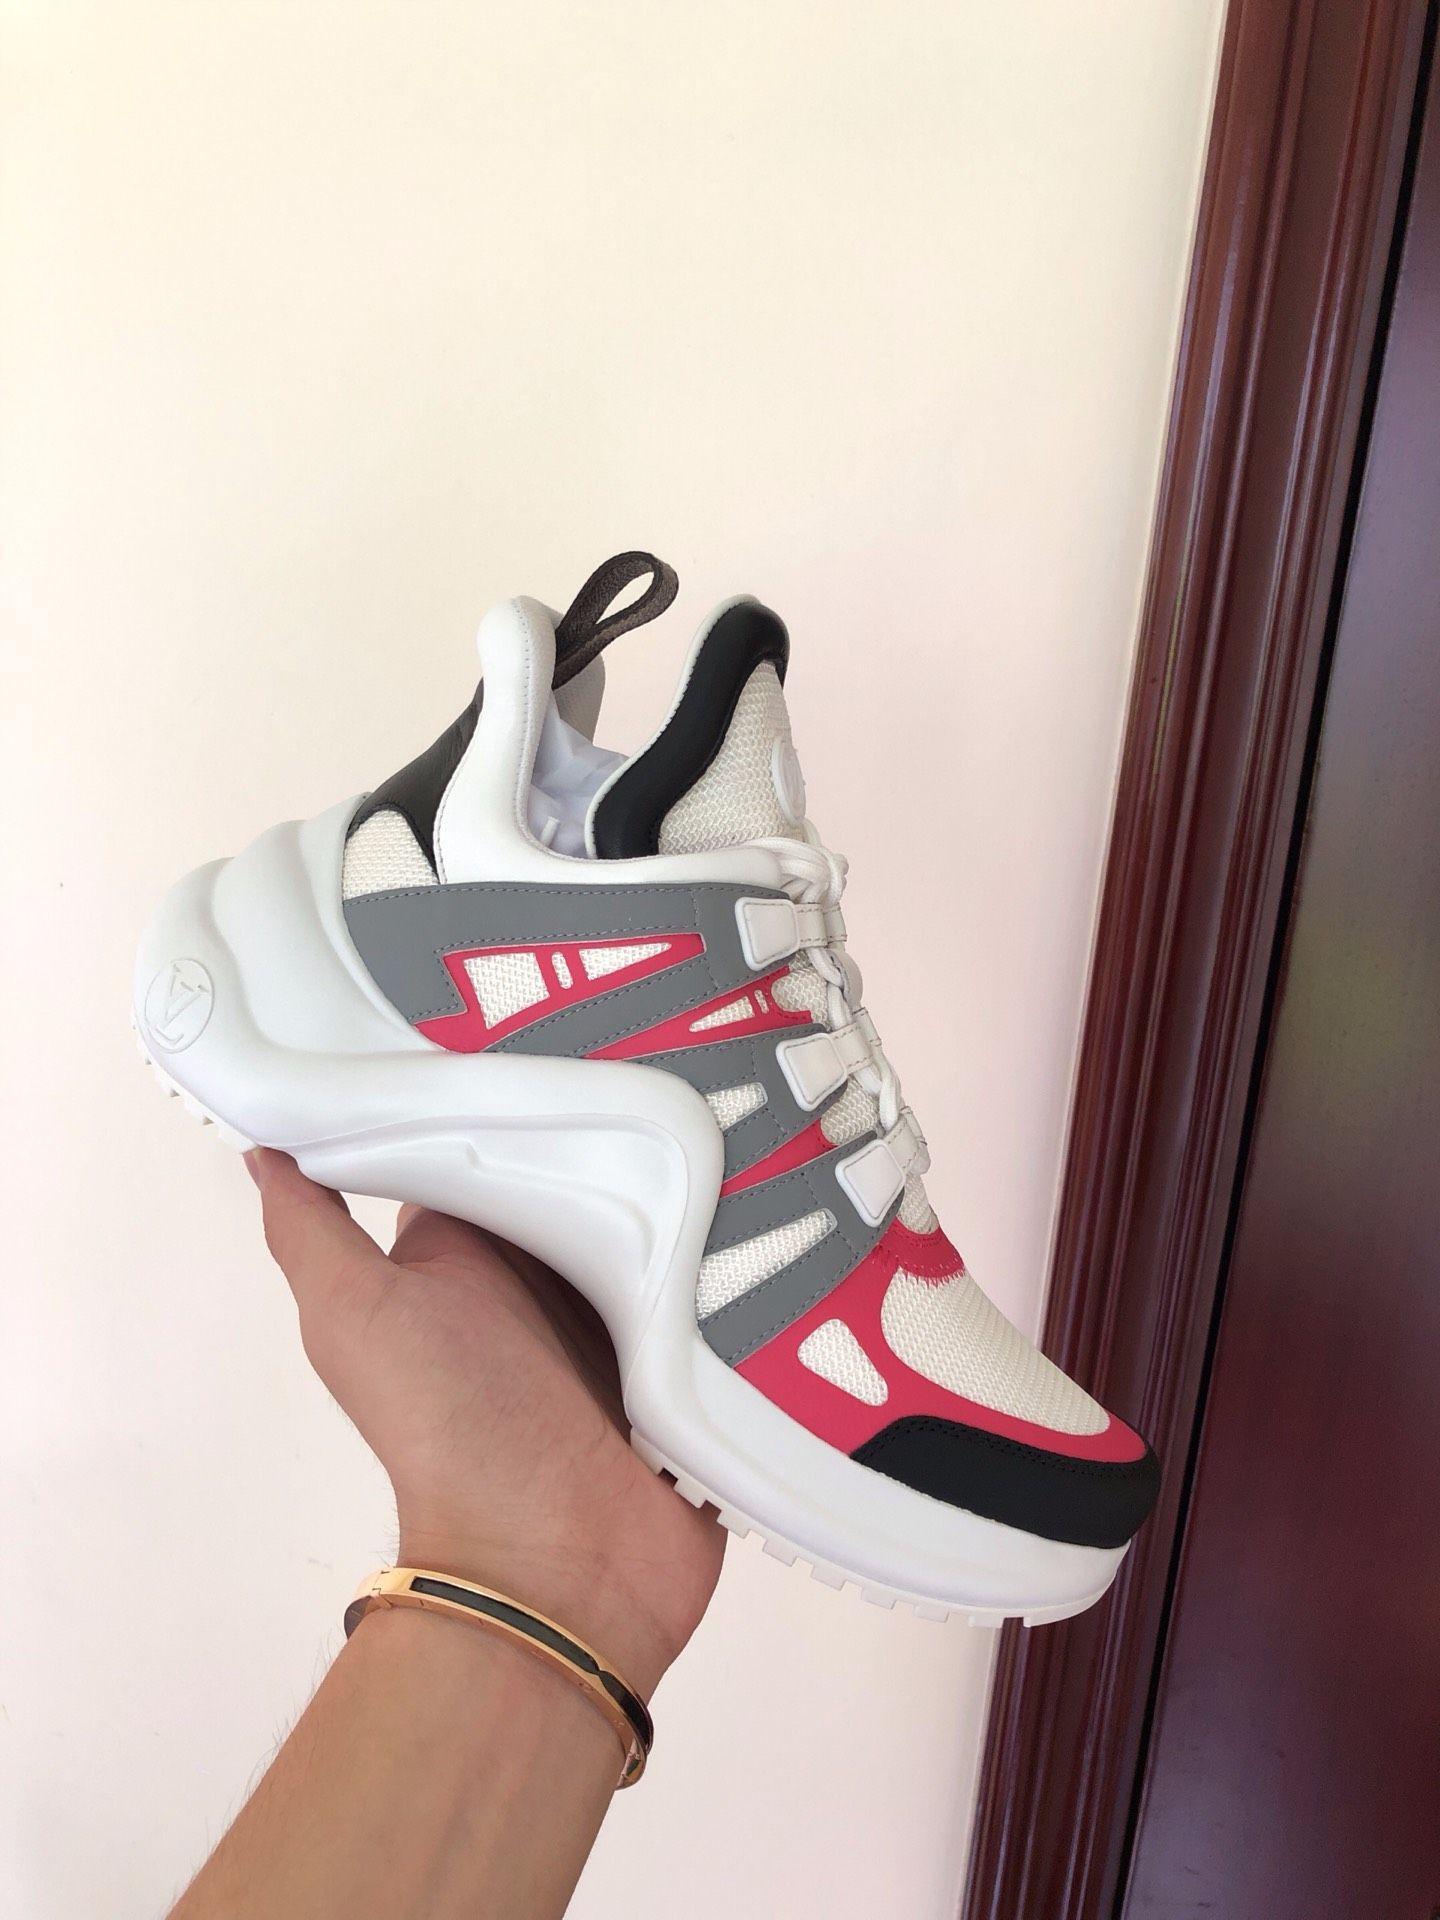 newest    archlight sneaker Rose Clair Pink  1A4X75    women sneaker  5